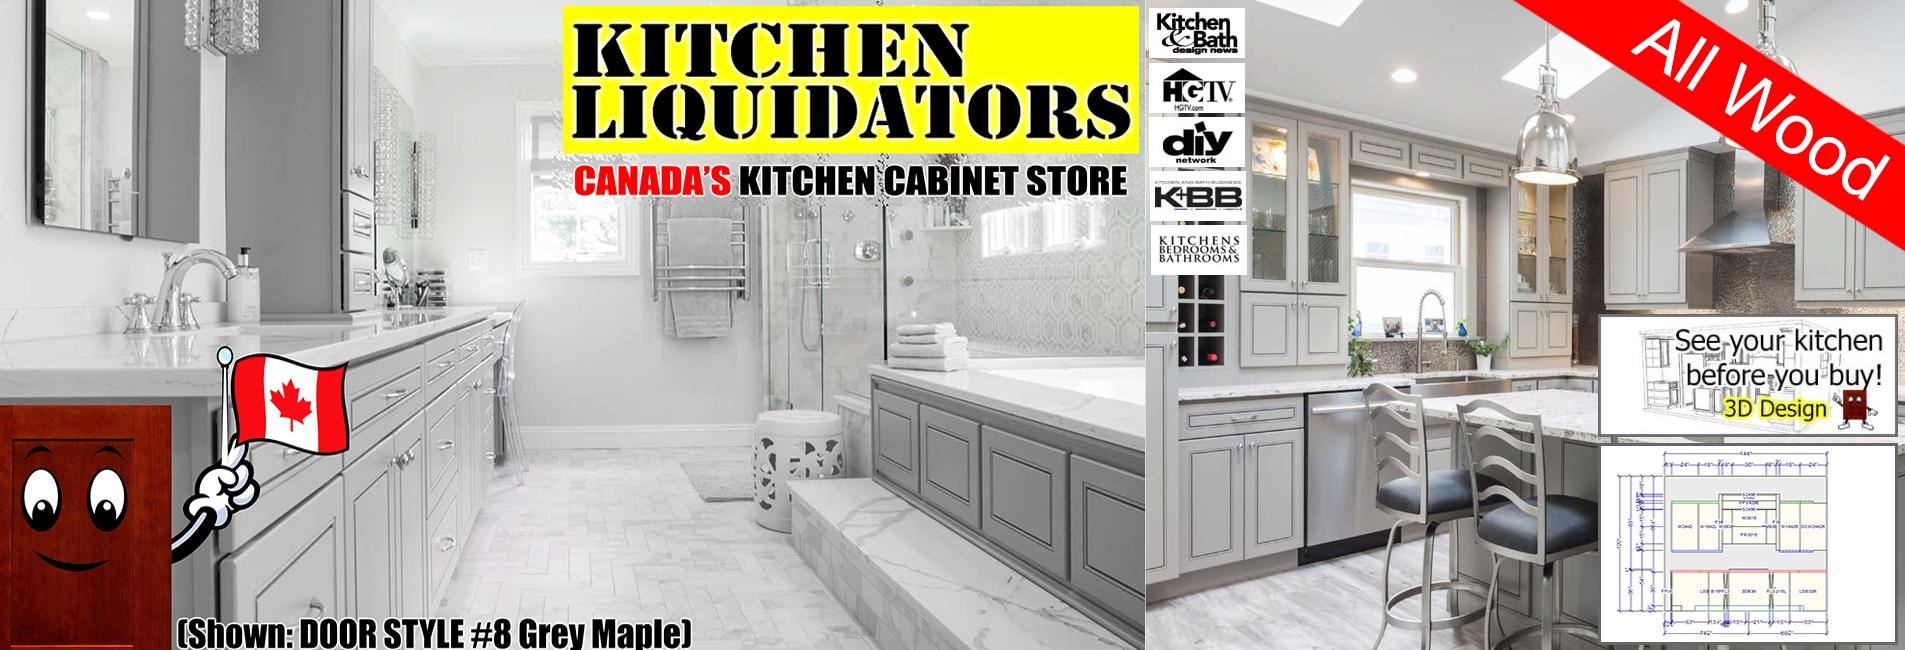 Canada Kitchen Liquidators – Kitchen Cabinets - Sinks